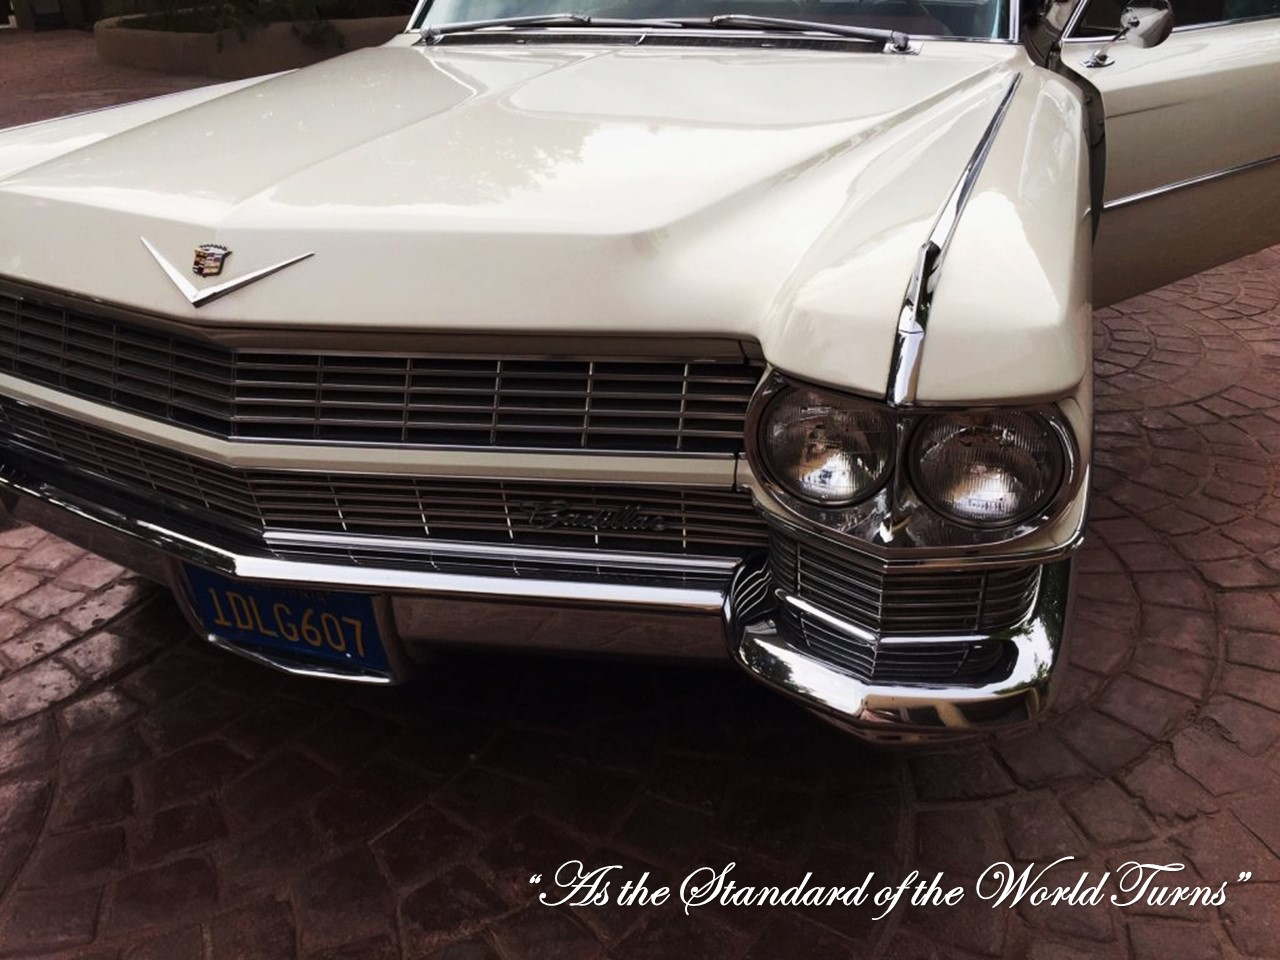 Jim Hailey Classic Cars | NotoriousLuxury